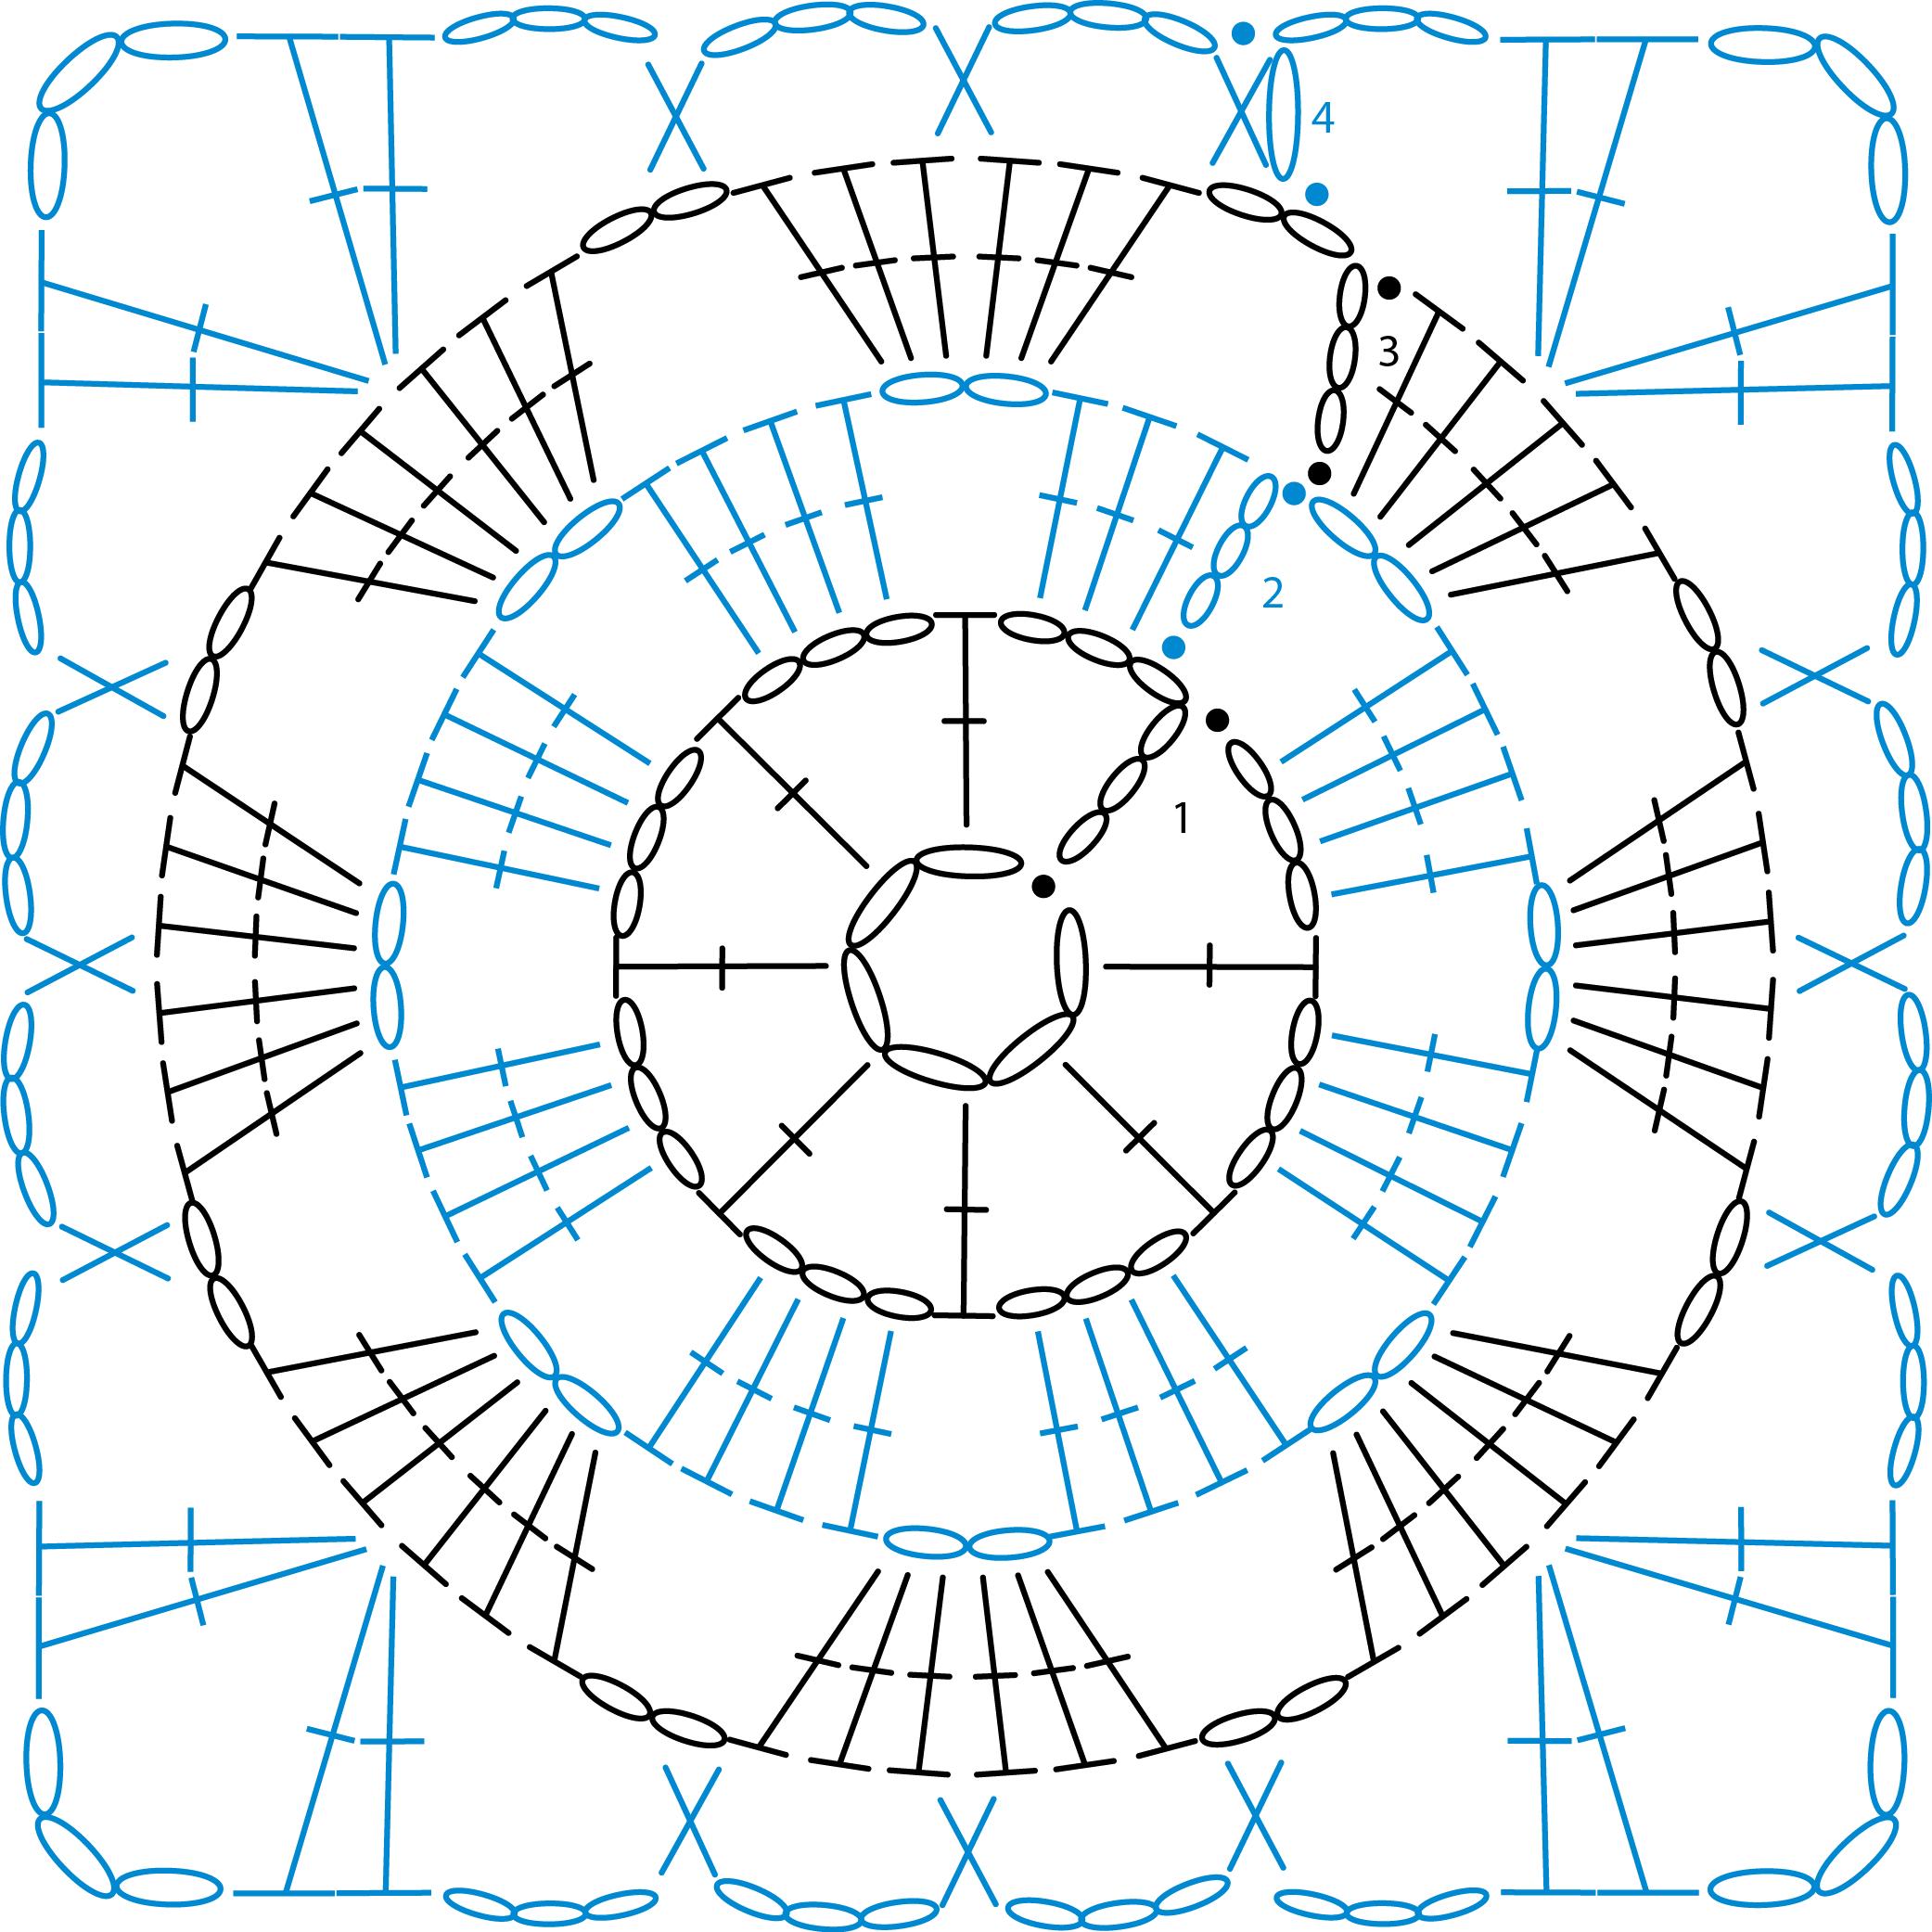 crochet granny square diagram honda goldwing 1200 wiring patterns simply knitting